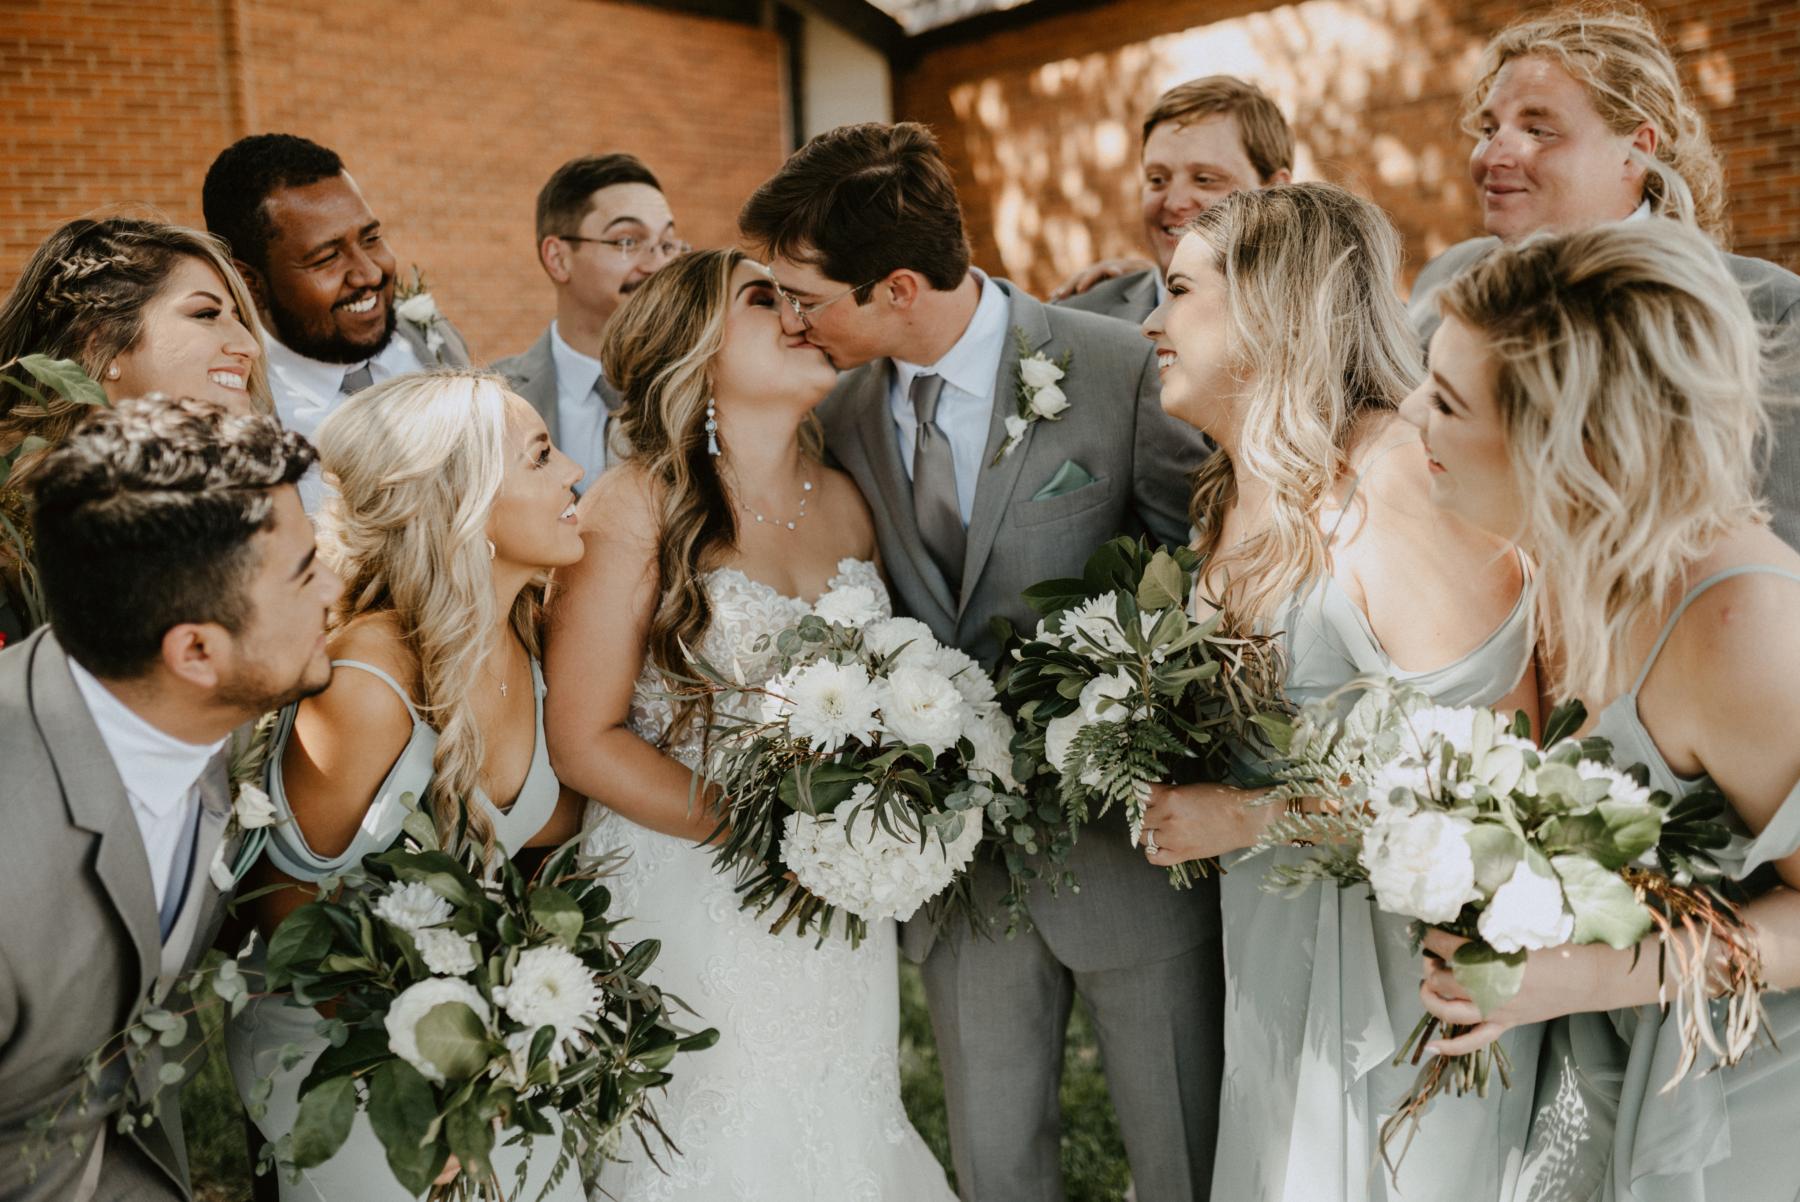 Jacqueline Davison Photography featured on Nashville Bride Guide